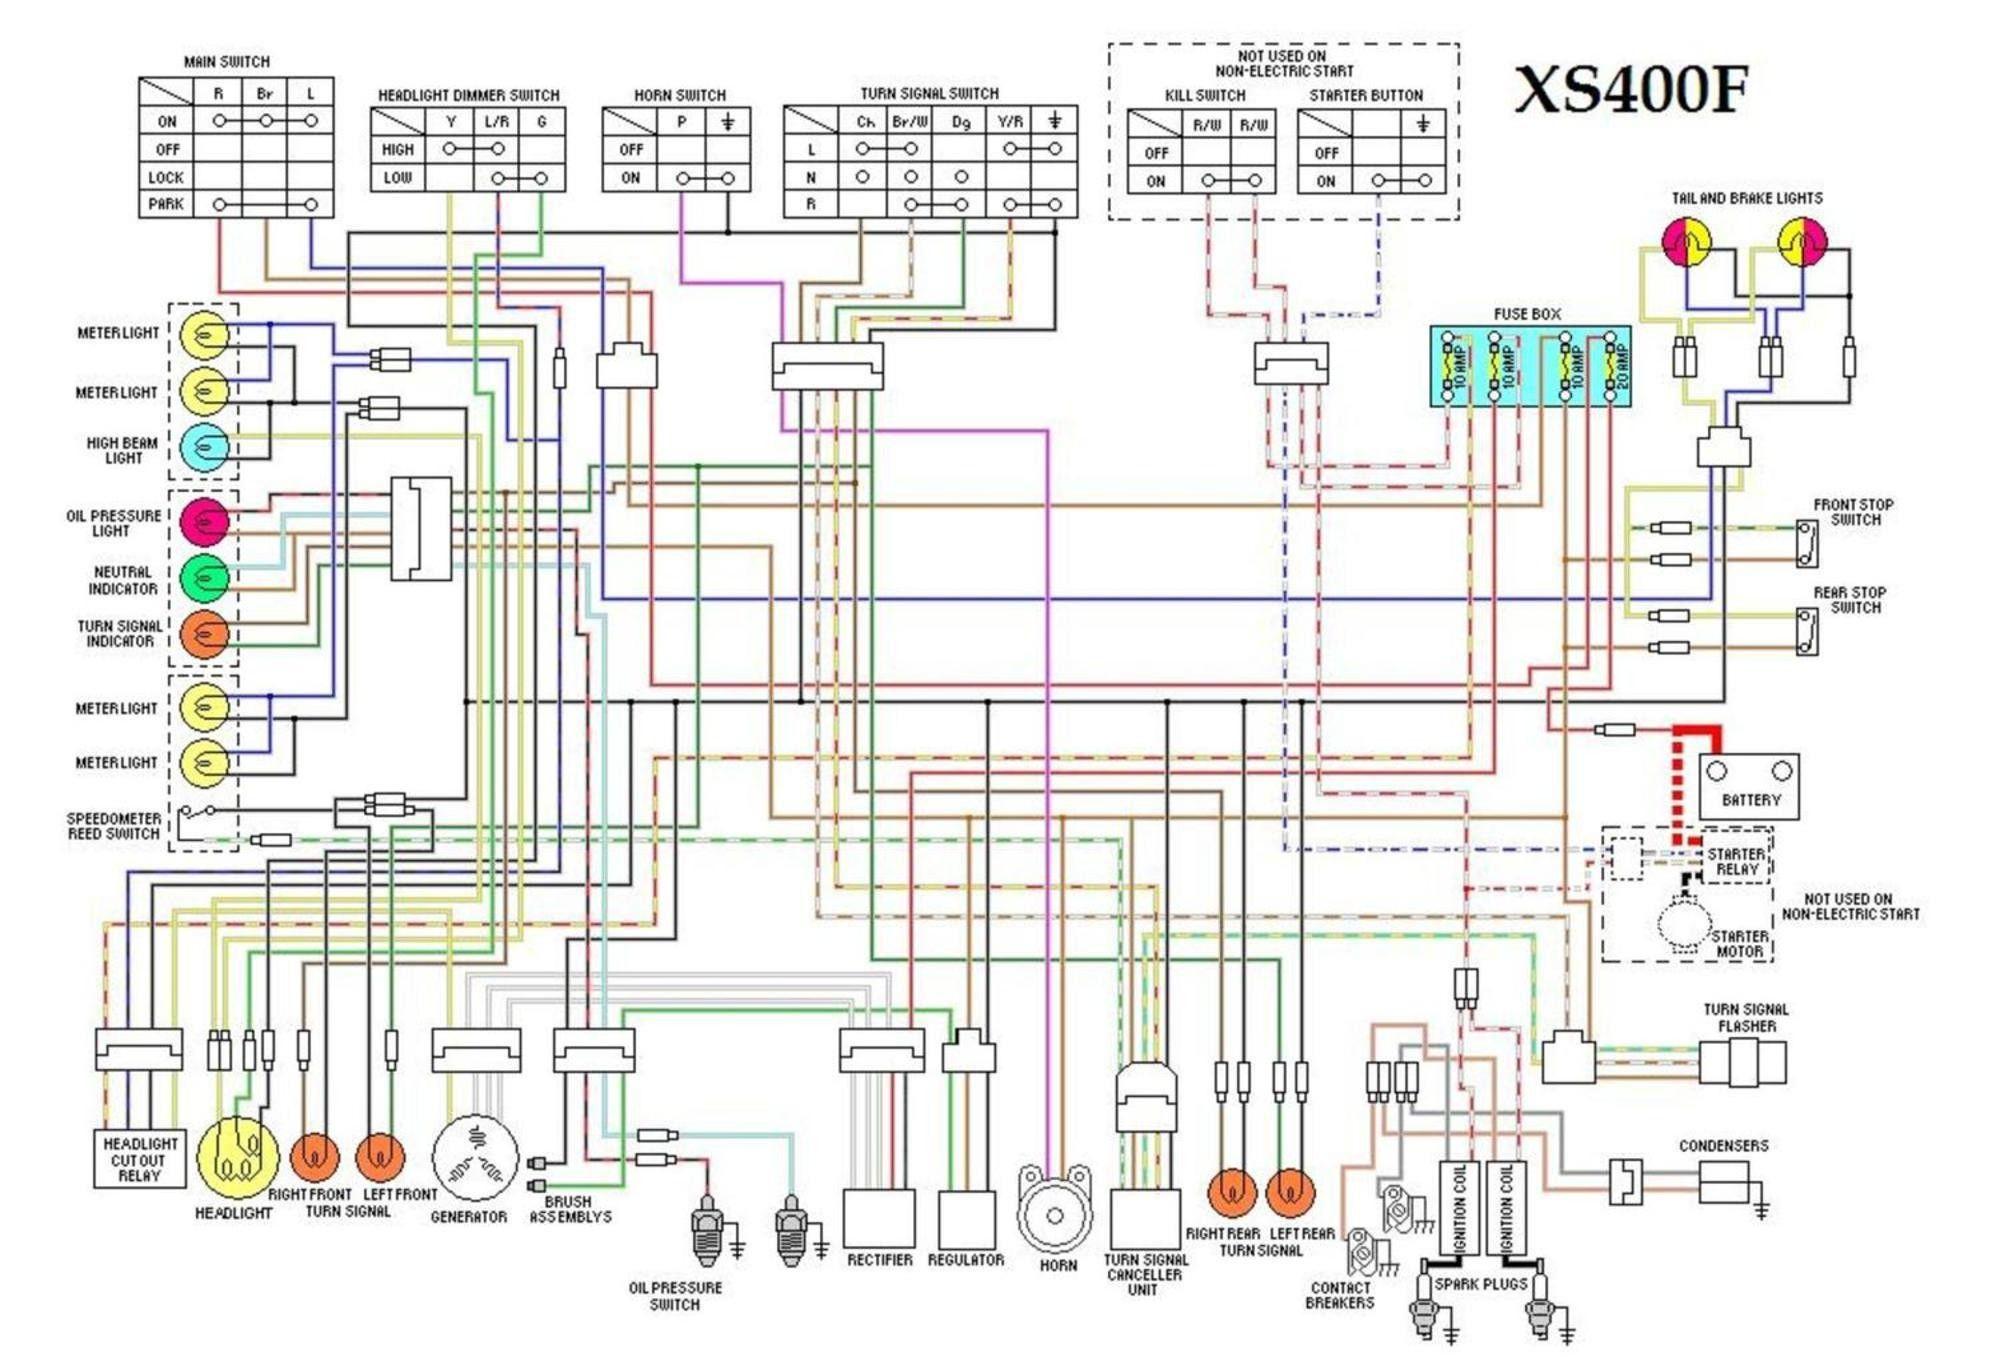 Awesome Wiring Diagram Xj 600 Diagrams Digramssample Diagramimages Wiringdiagramsample Wiringdiagram Check M Motorcycle Wiring Diagram Motorcycle Mechanic